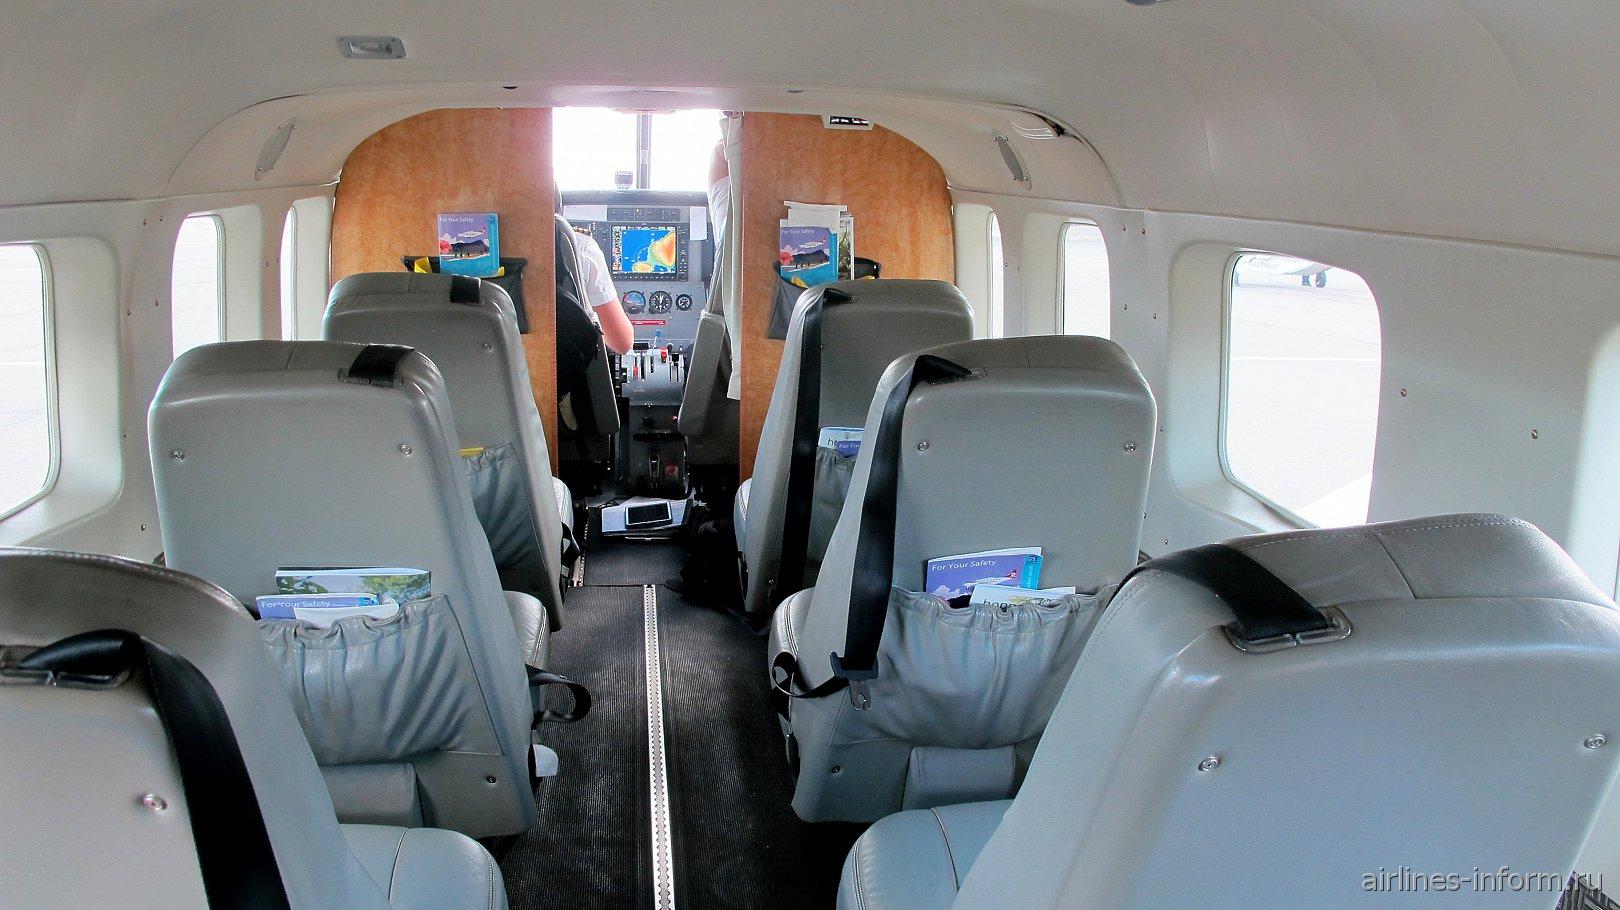 ����� �������� Cessna Caravan ������������ Mokulele Airlines